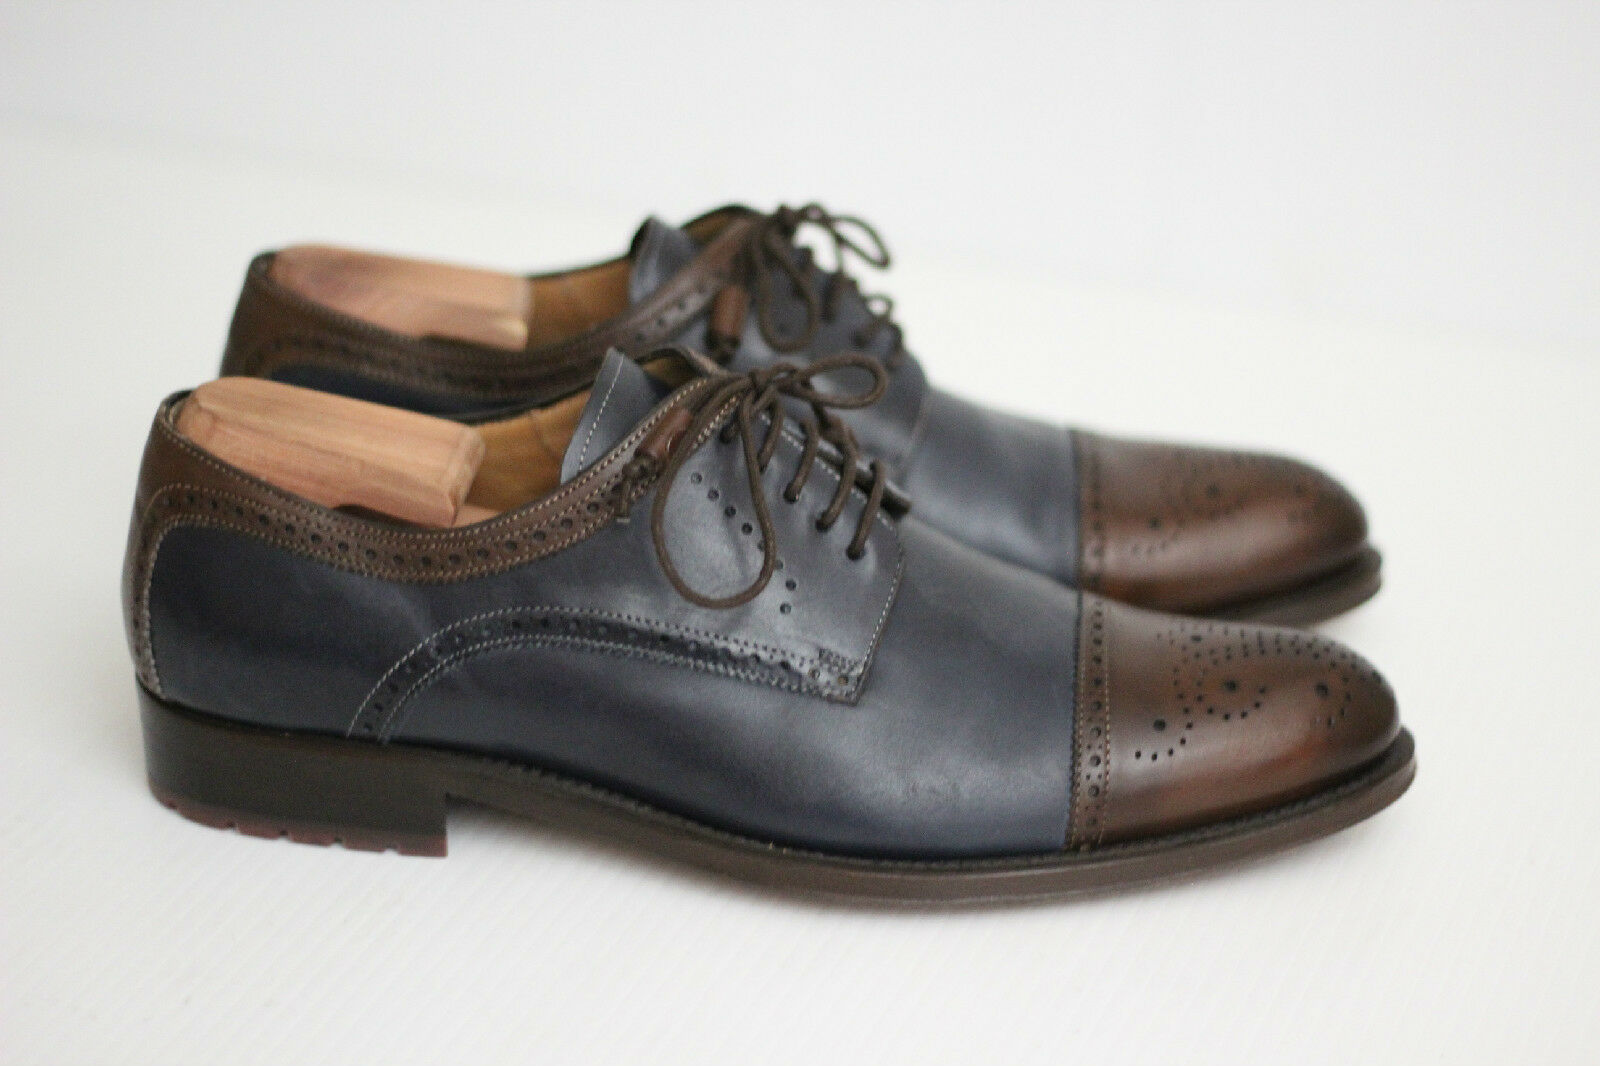 NEW Mezlan 'Carlino' Cap Toe Oxford - Brown   bluee - Size 10 M (Y87)